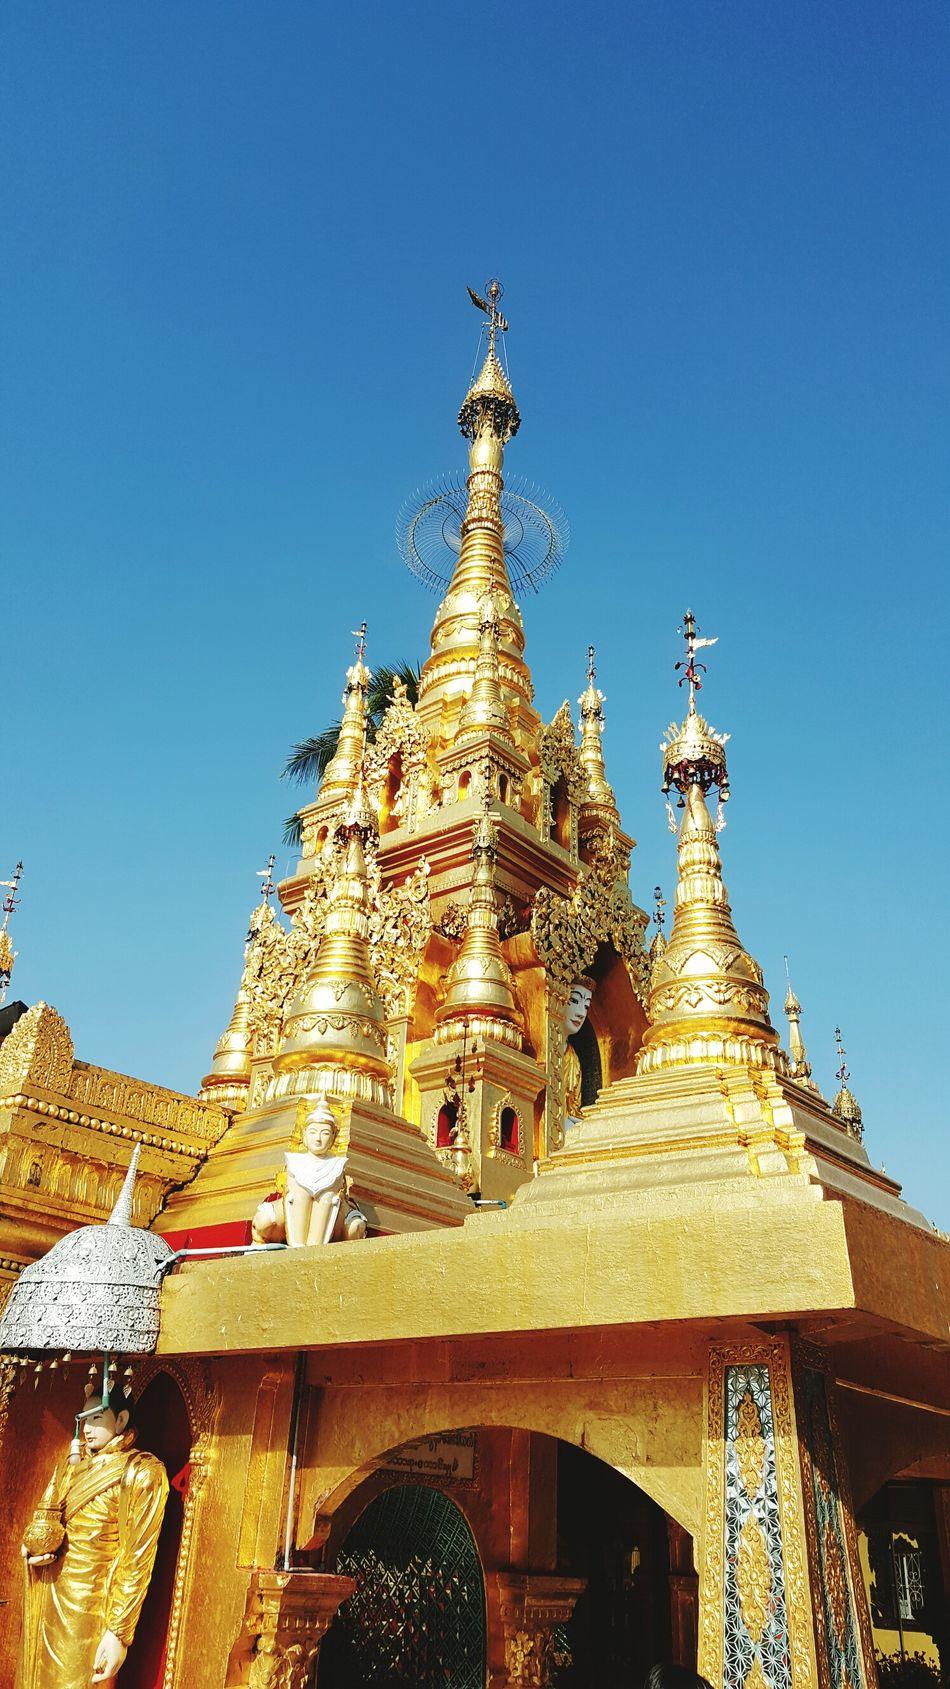 midstream temple at myanmar